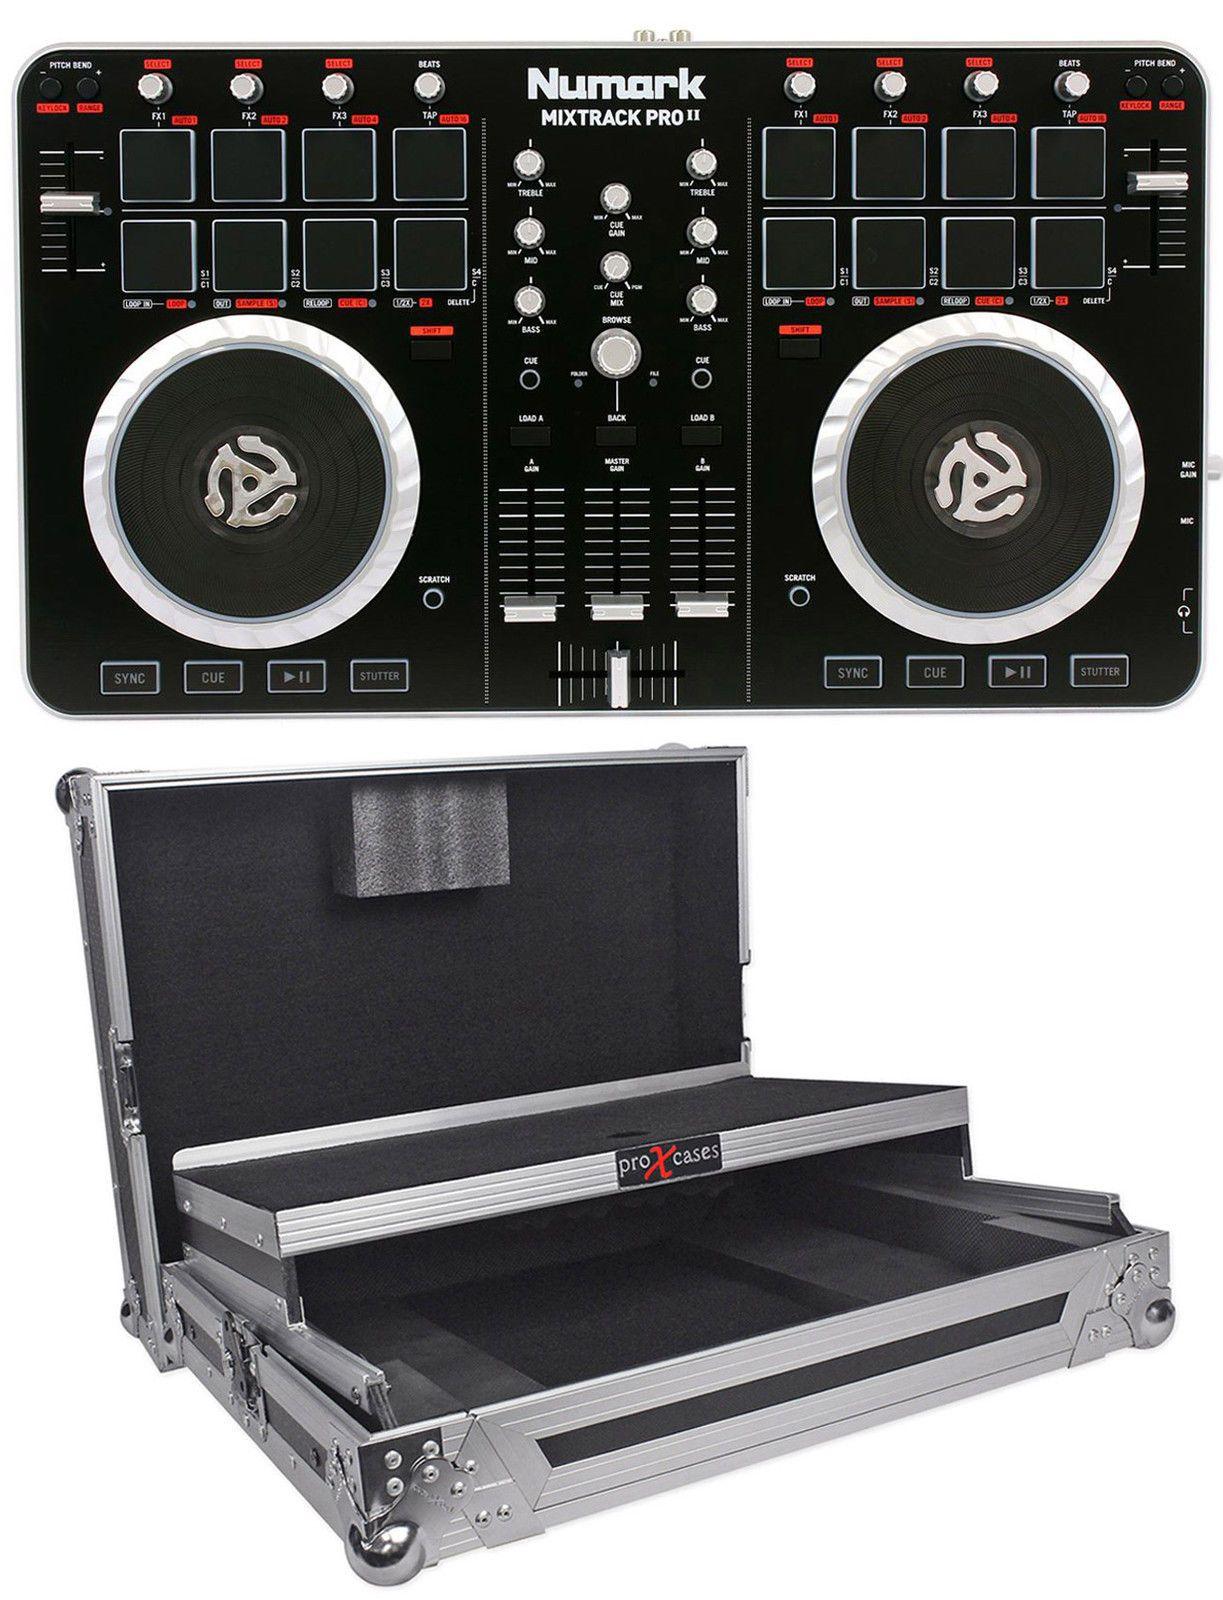 Numark Mixtrack Pro Ii 2 Midi Usb Dj Controller Audio Dj Equipment Usb Audio